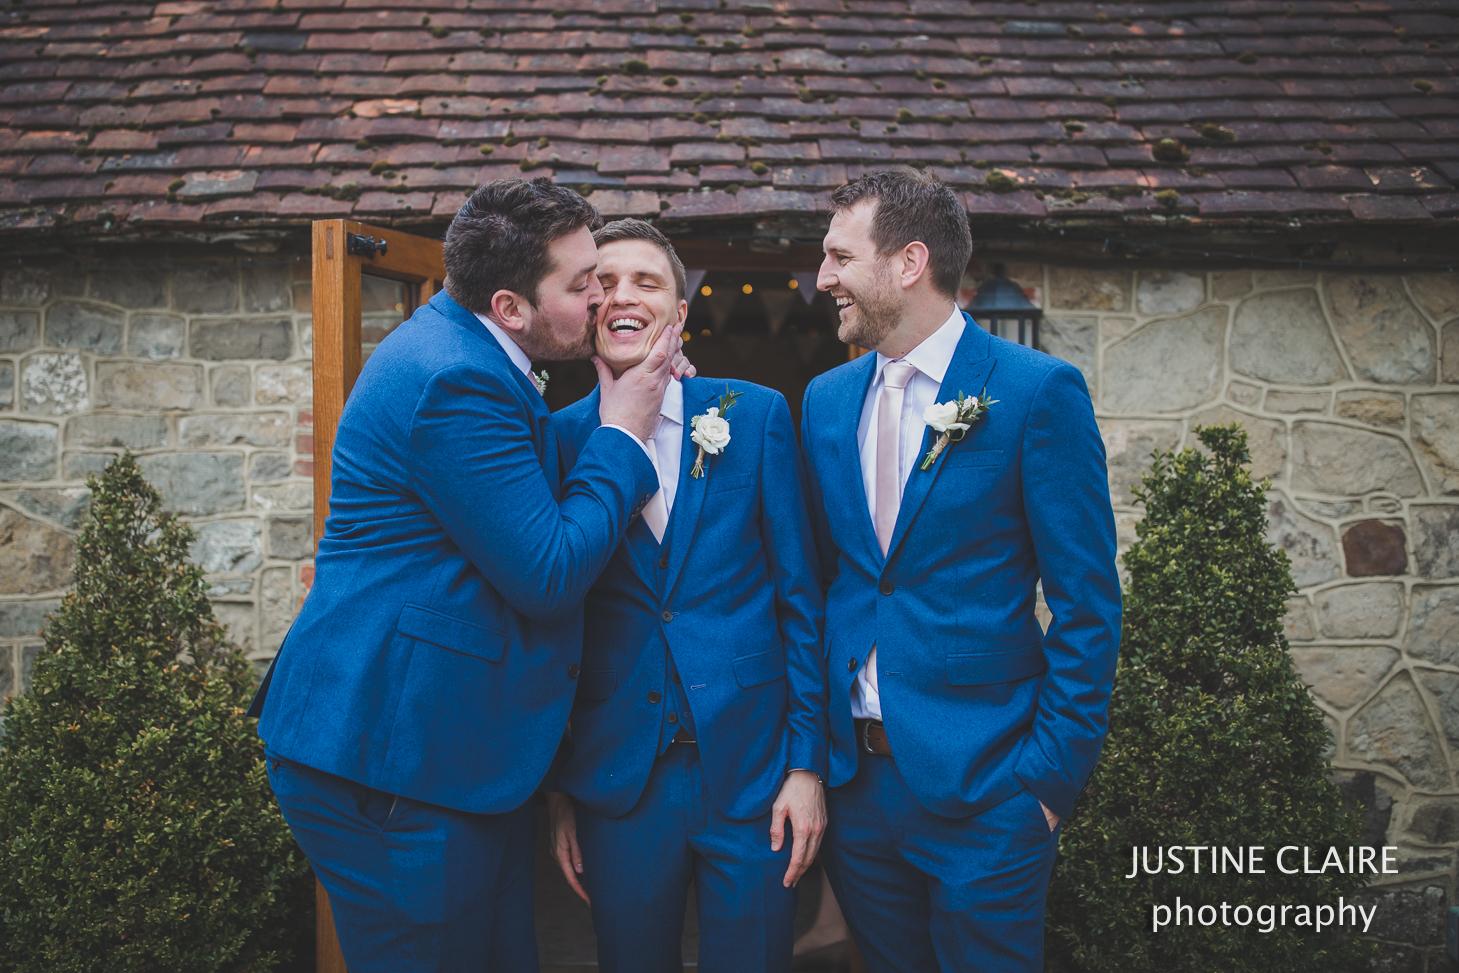 Fitzleroi Fittleworth petworth Billingshurst farm Wedding Photography by Justine Claire photographer Arundel Worthing Brighton-13.jpg